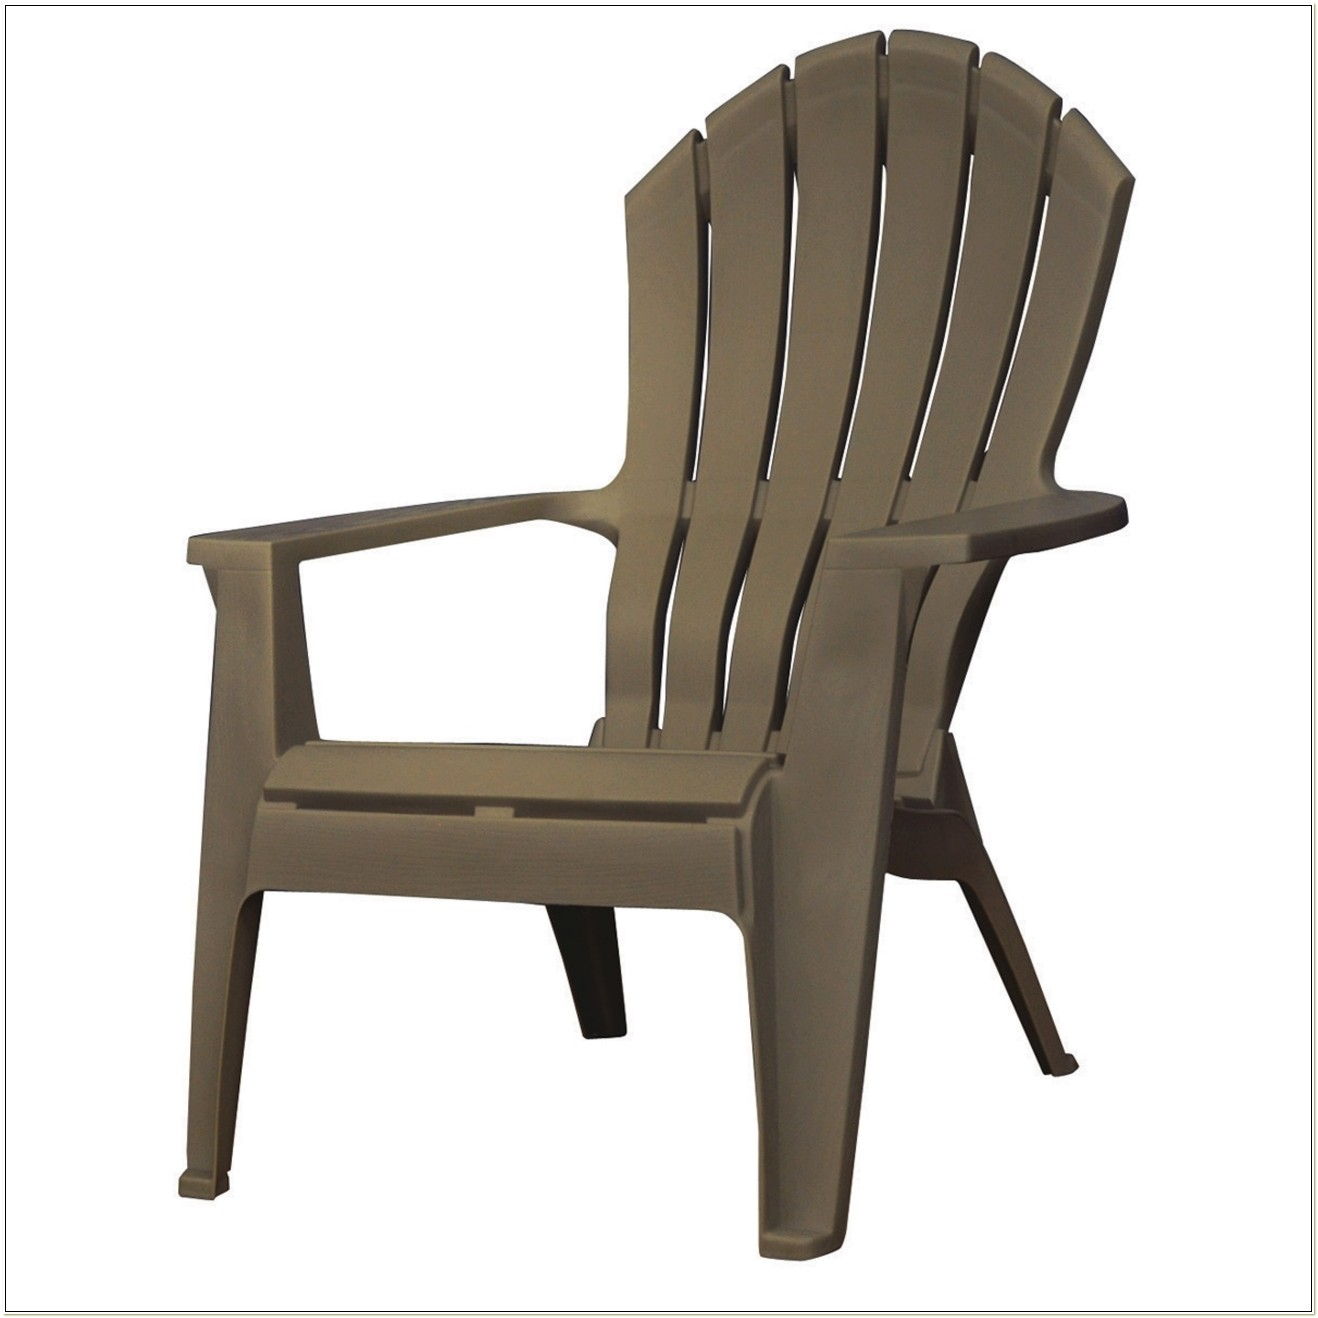 Adams Mfg Corp Ergo Adirondack Chair